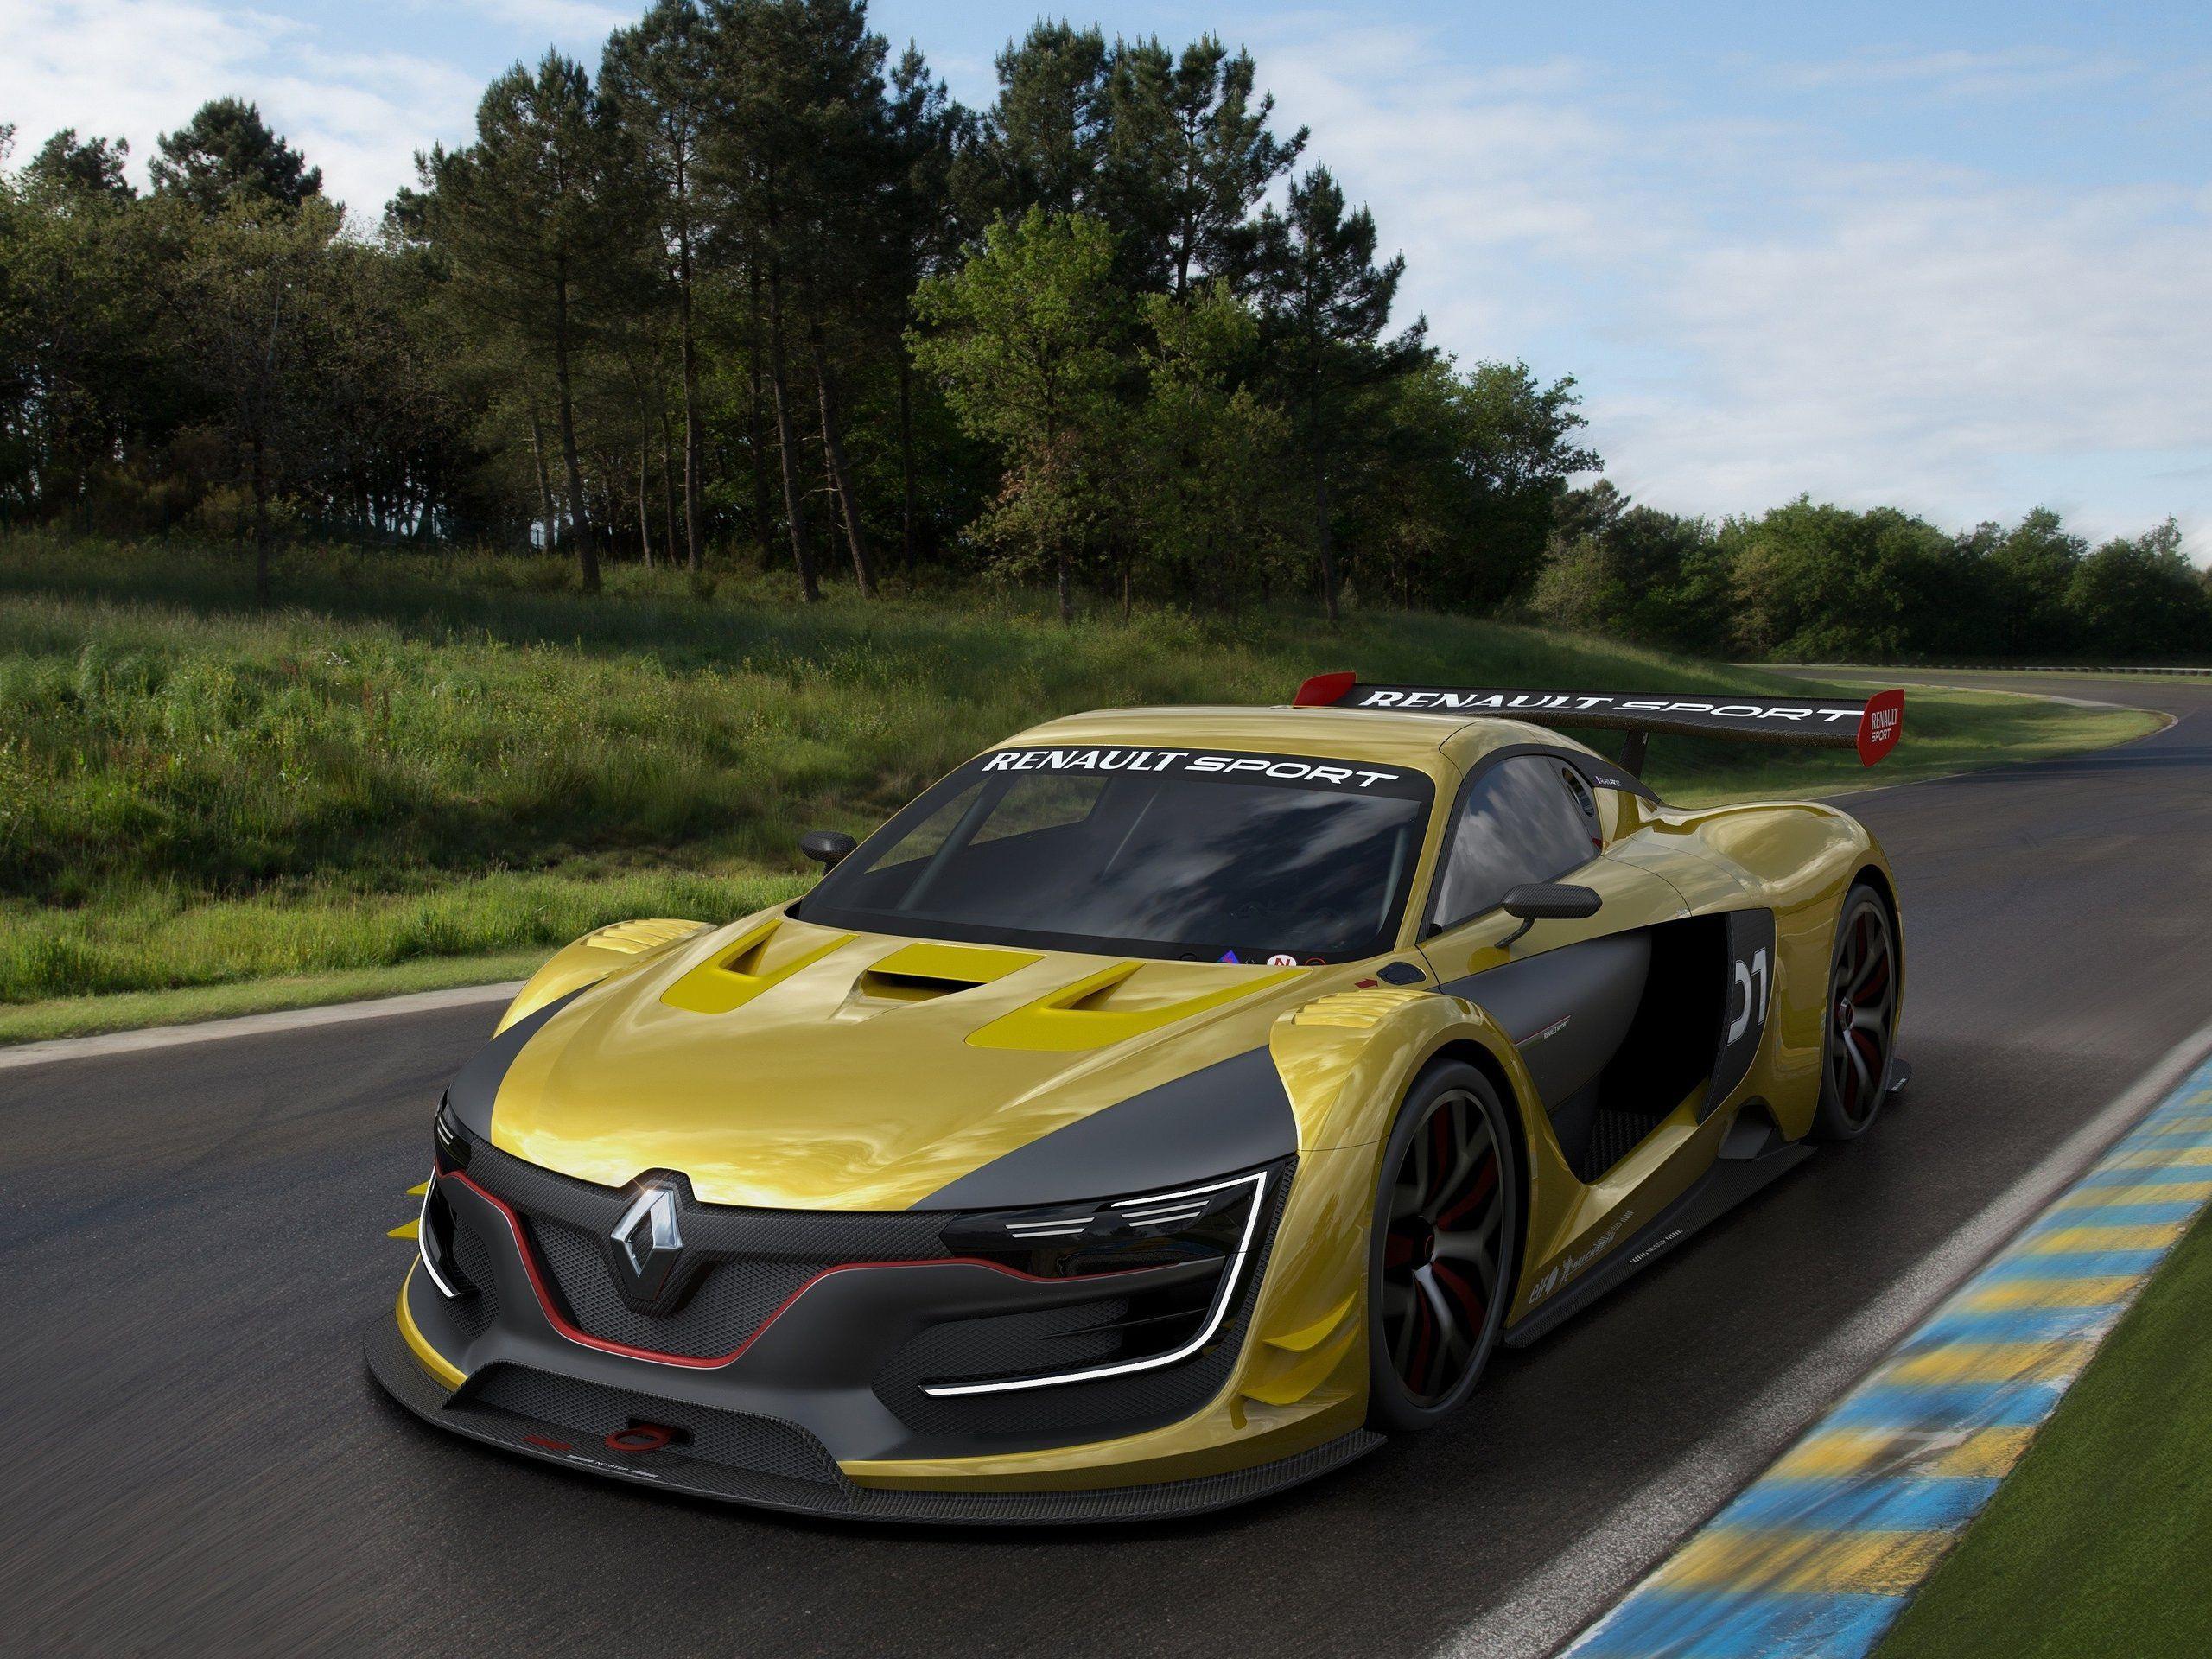 Renault Sport RS 01 2015 Wallpaper